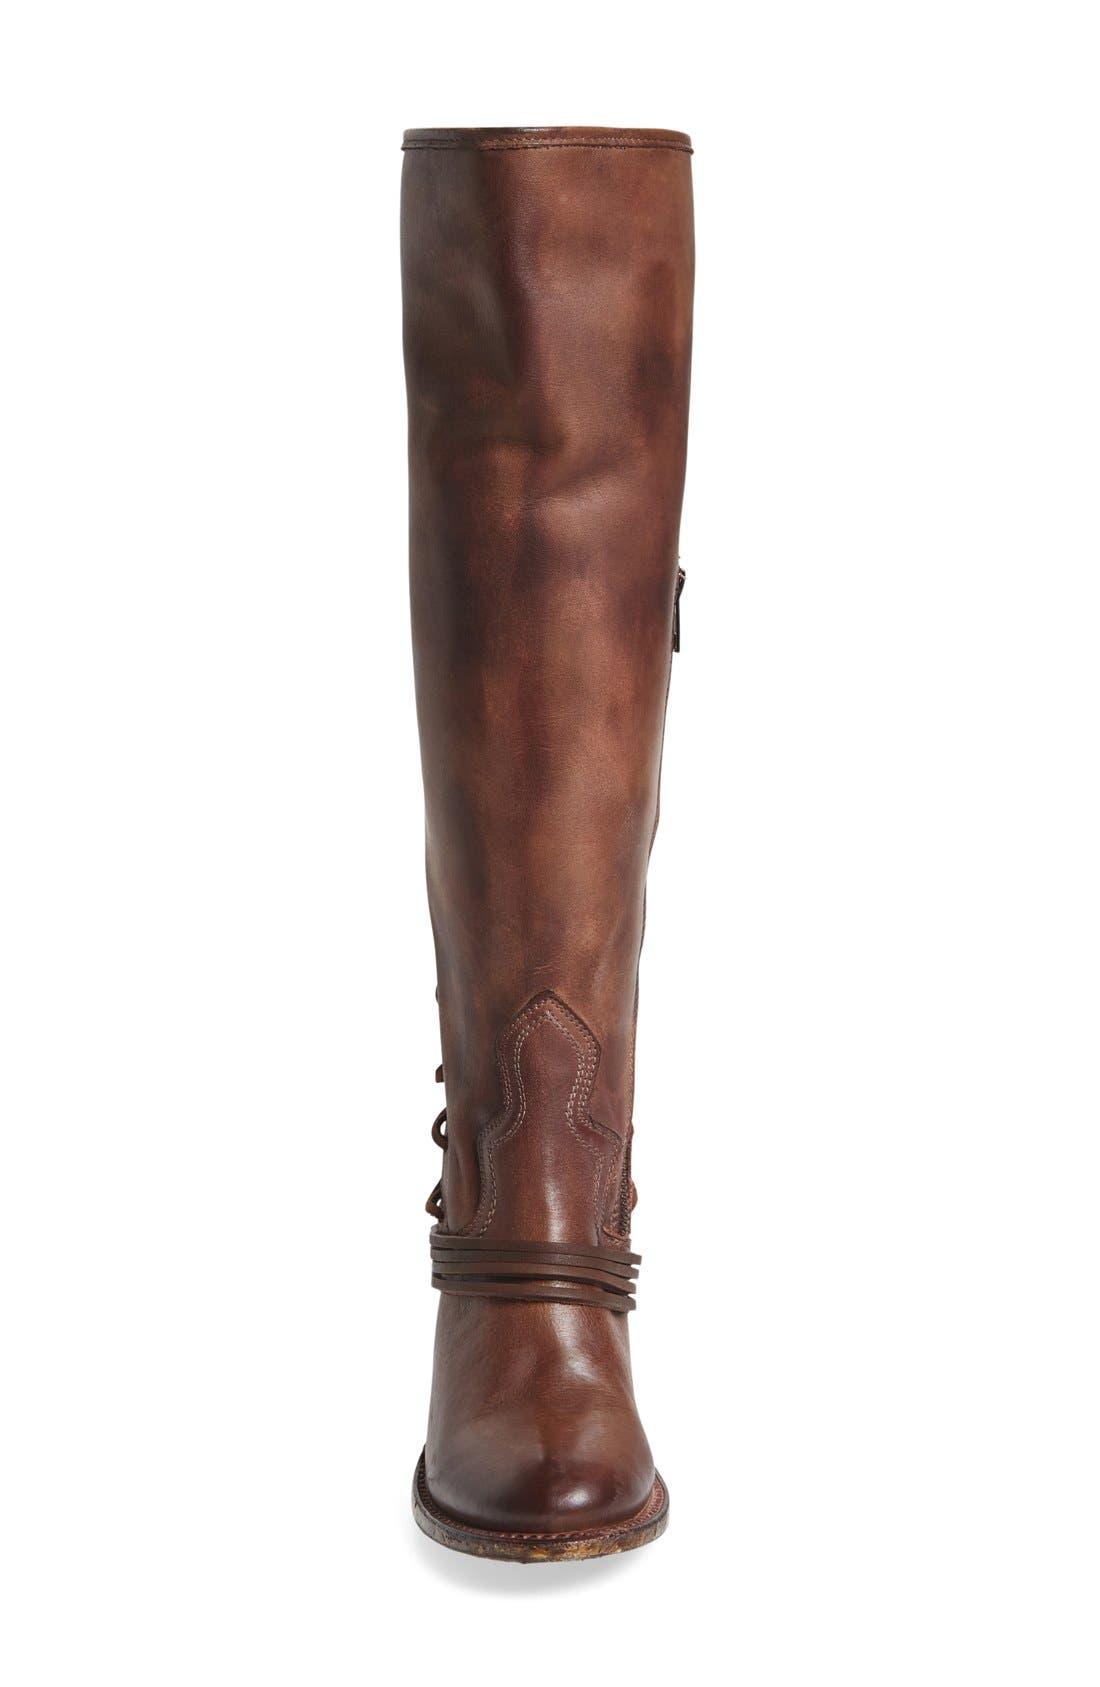 'Coal' Tall Leather Boot,                             Alternate thumbnail 3, color,                             PLUM